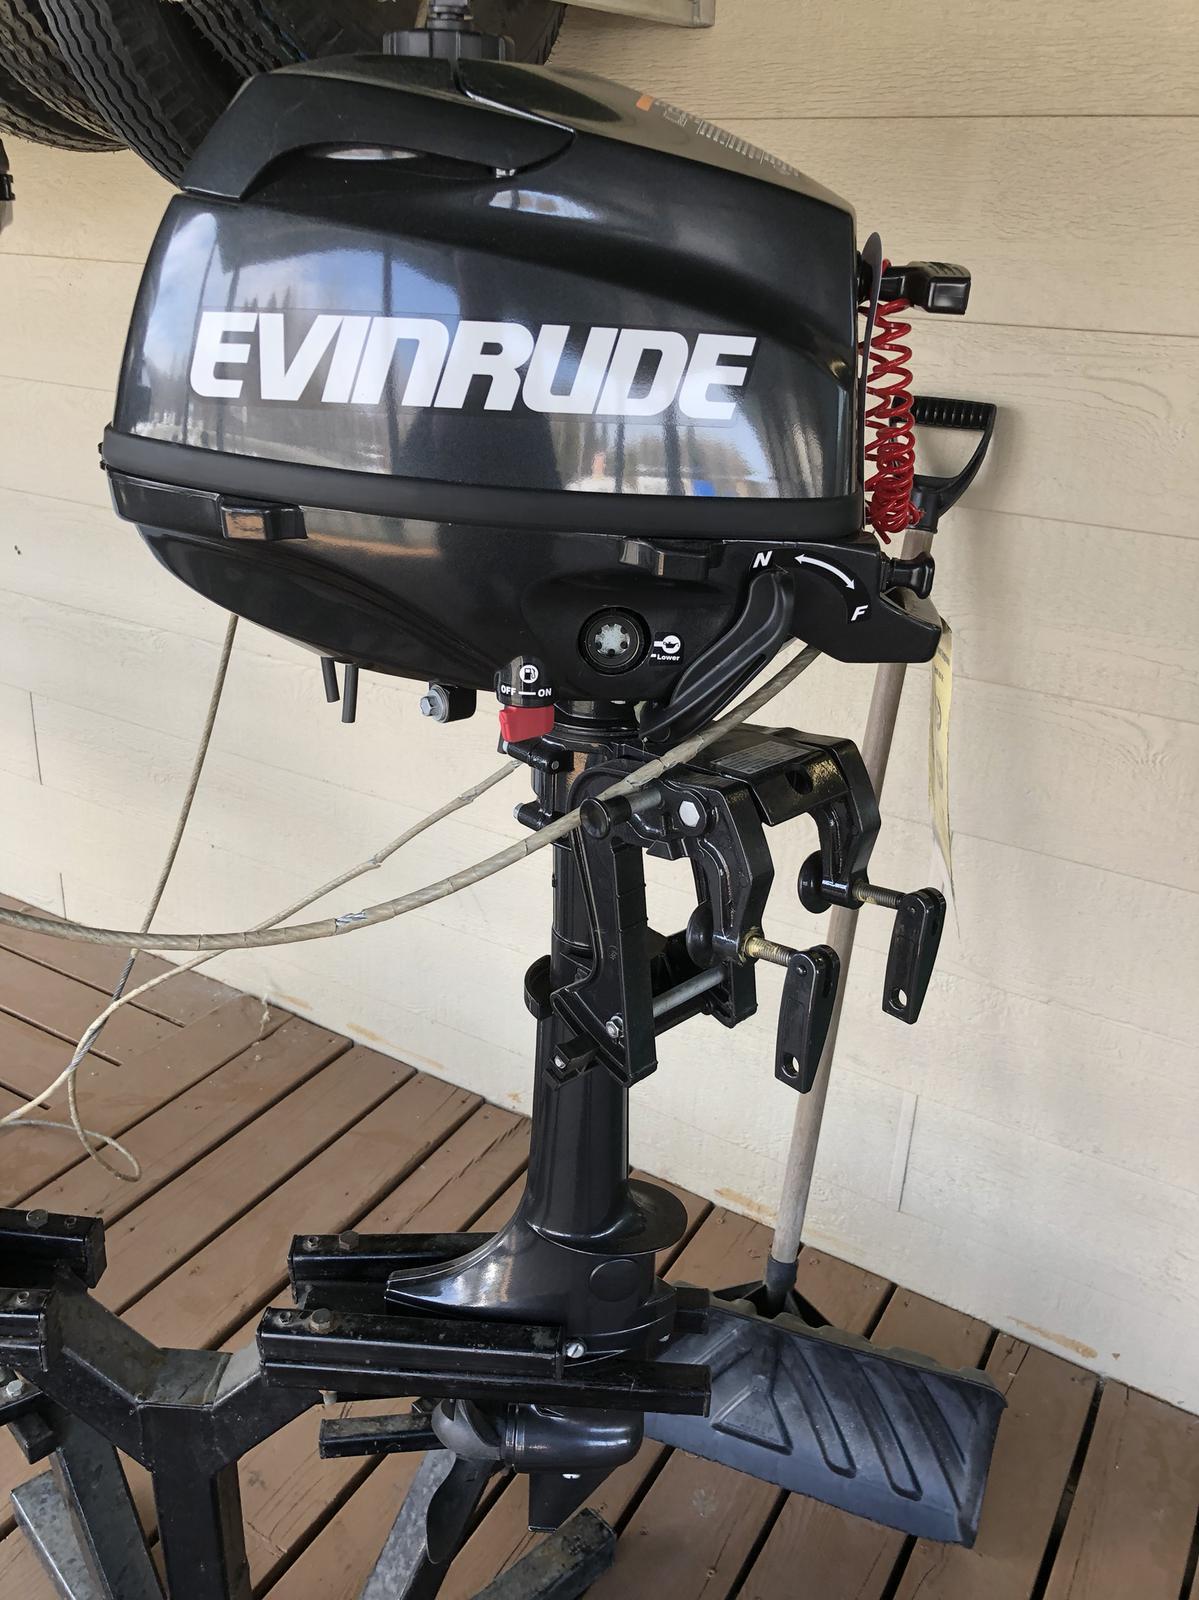 2018 Outboard Motors from Evinrude Nestor Falls Marine